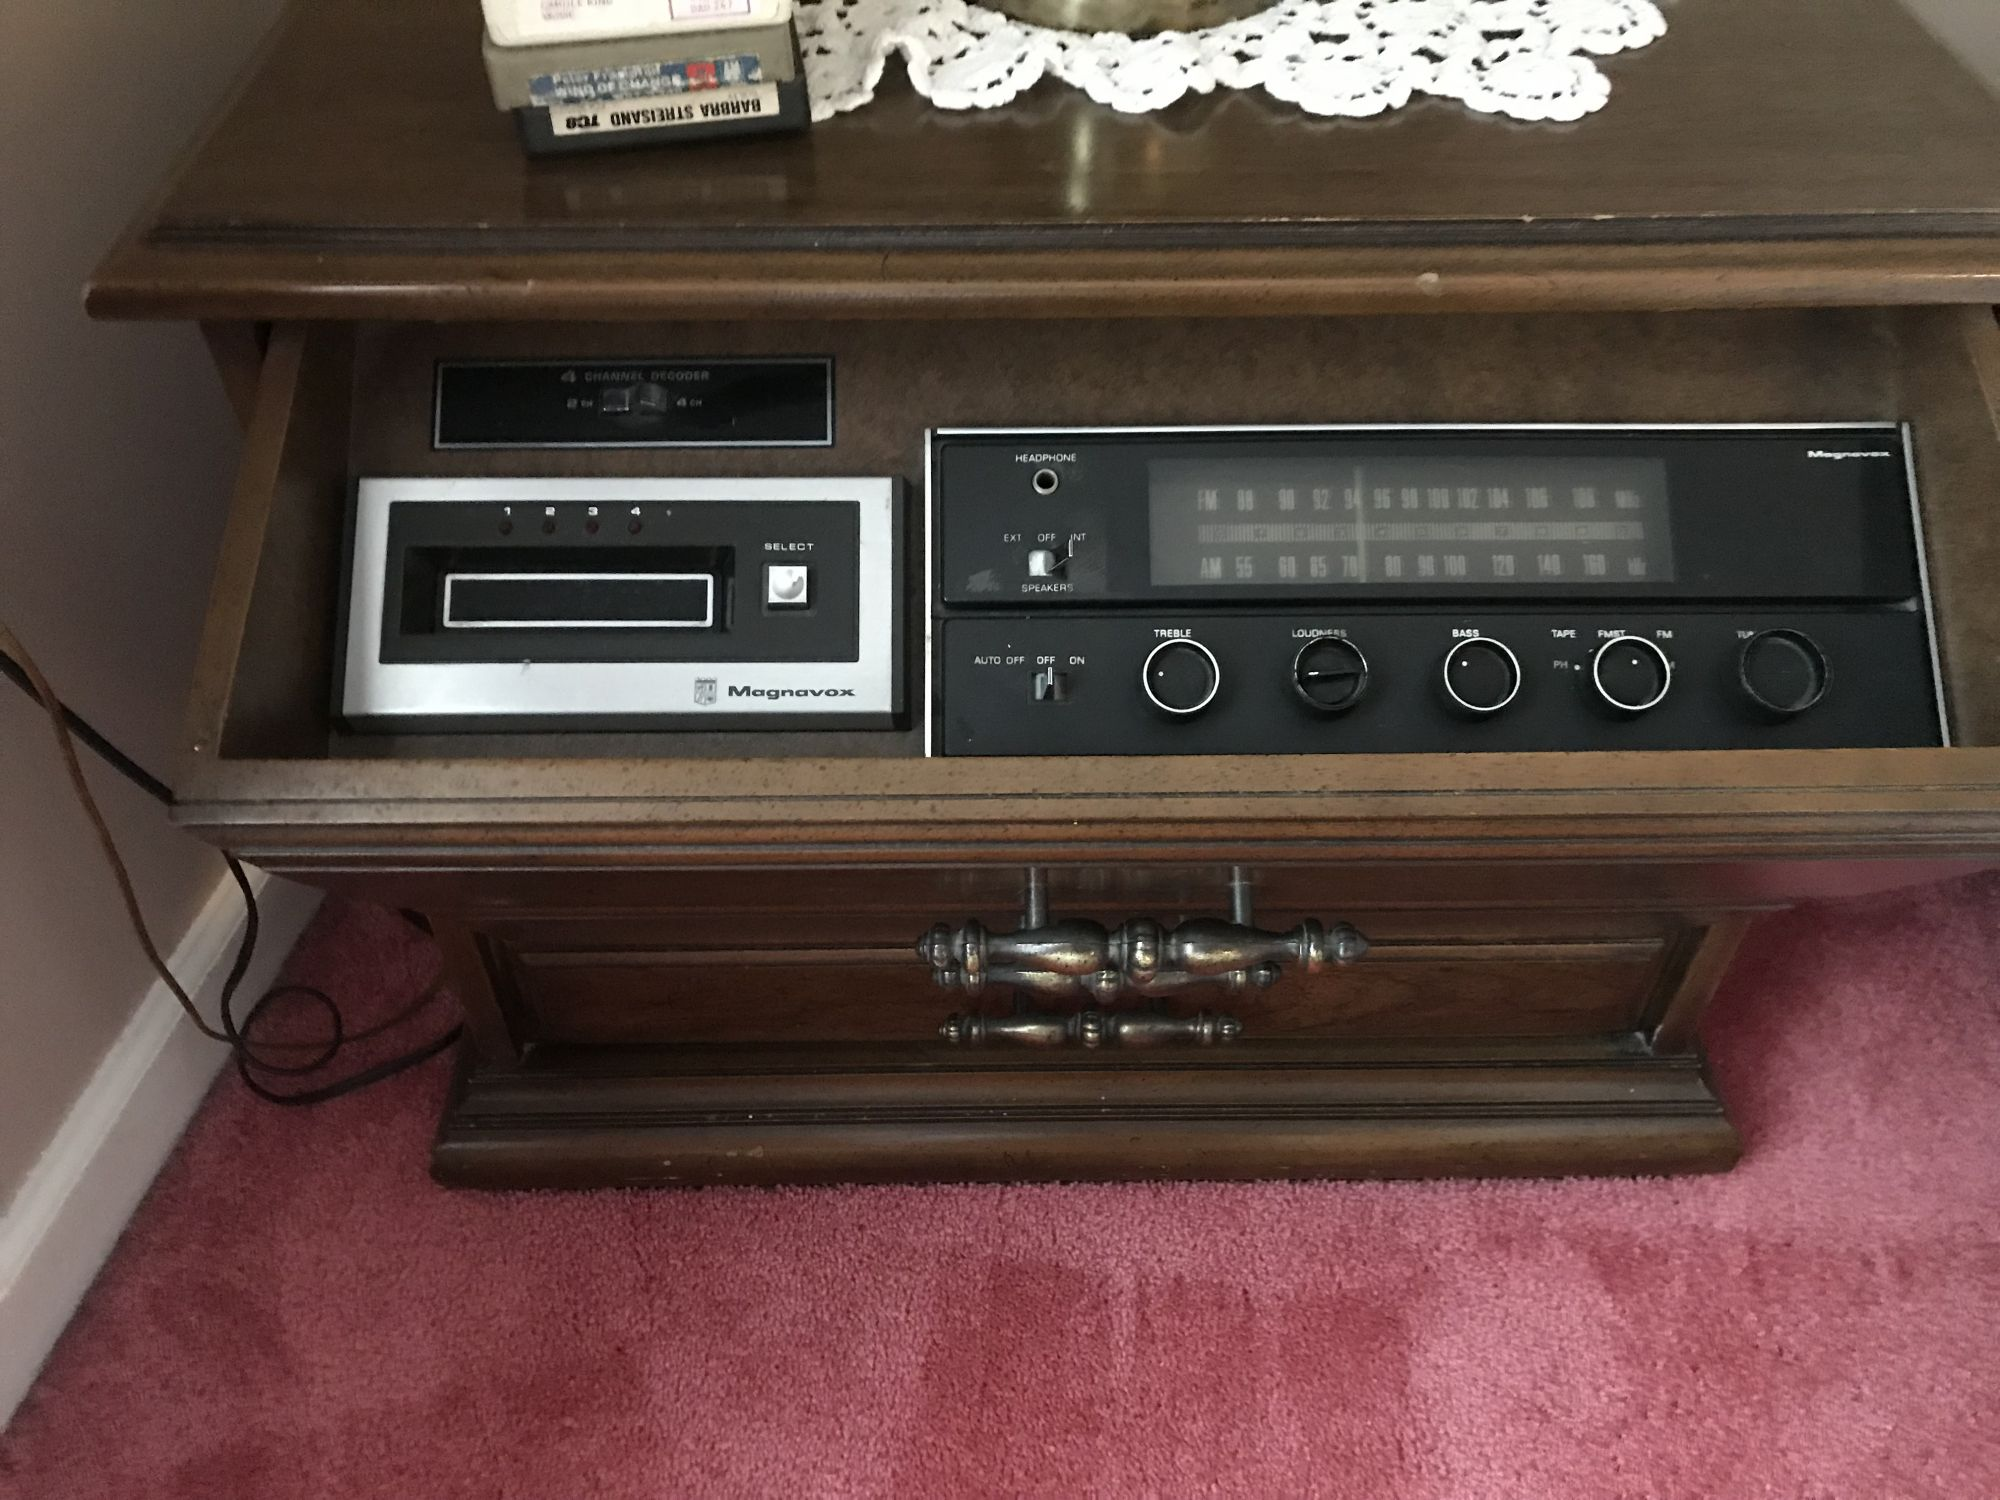 Wondrous Vintage Magnavox 8 Track Stereo Console End Table Interior Design Ideas Gentotryabchikinfo